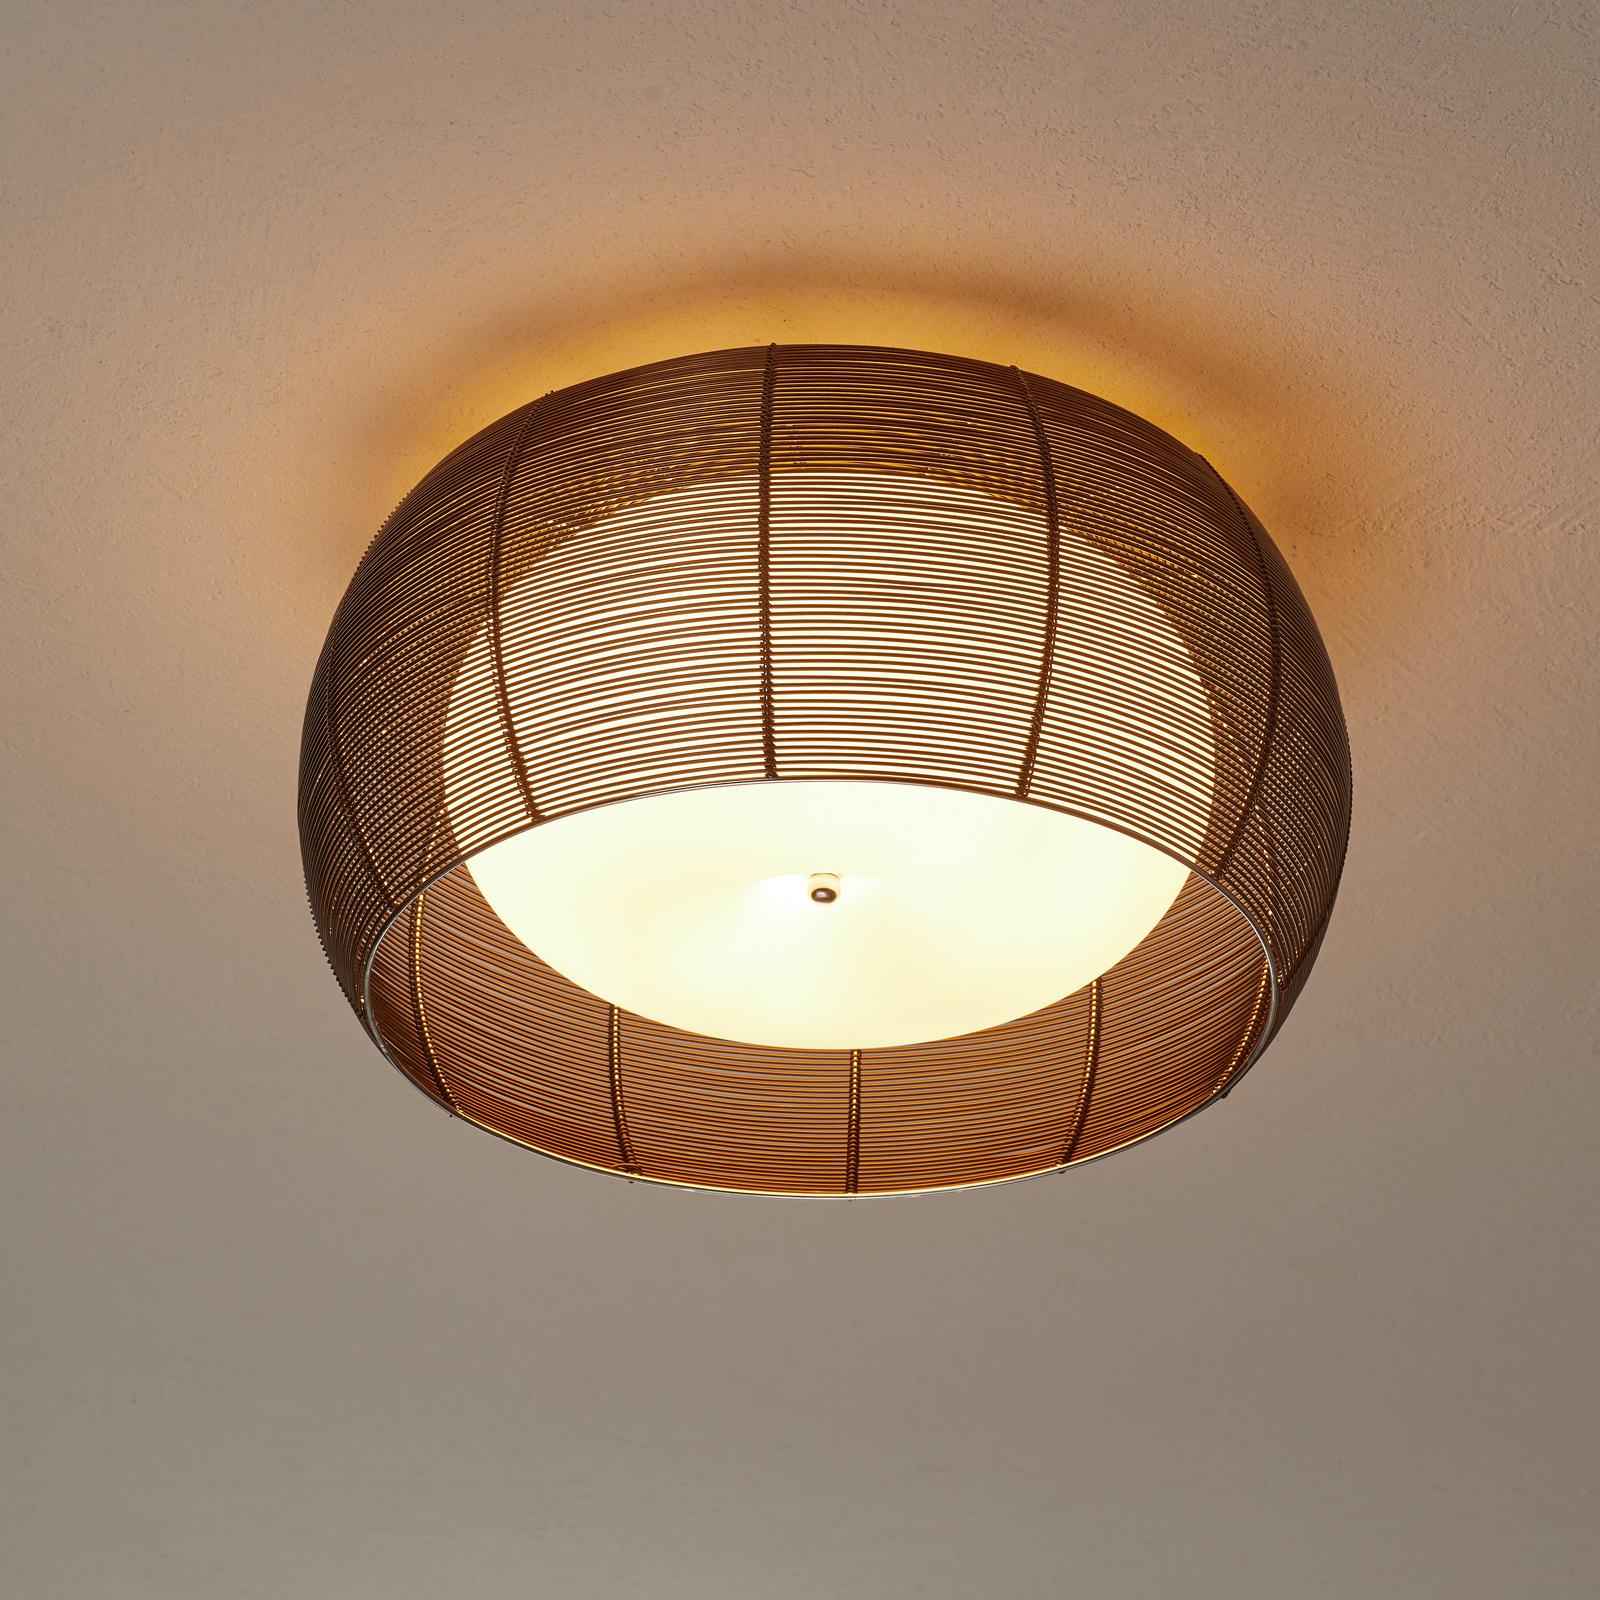 Hengelampe Relax, 1 lyskilde, 40 cm bronse | Lampegiganten.no